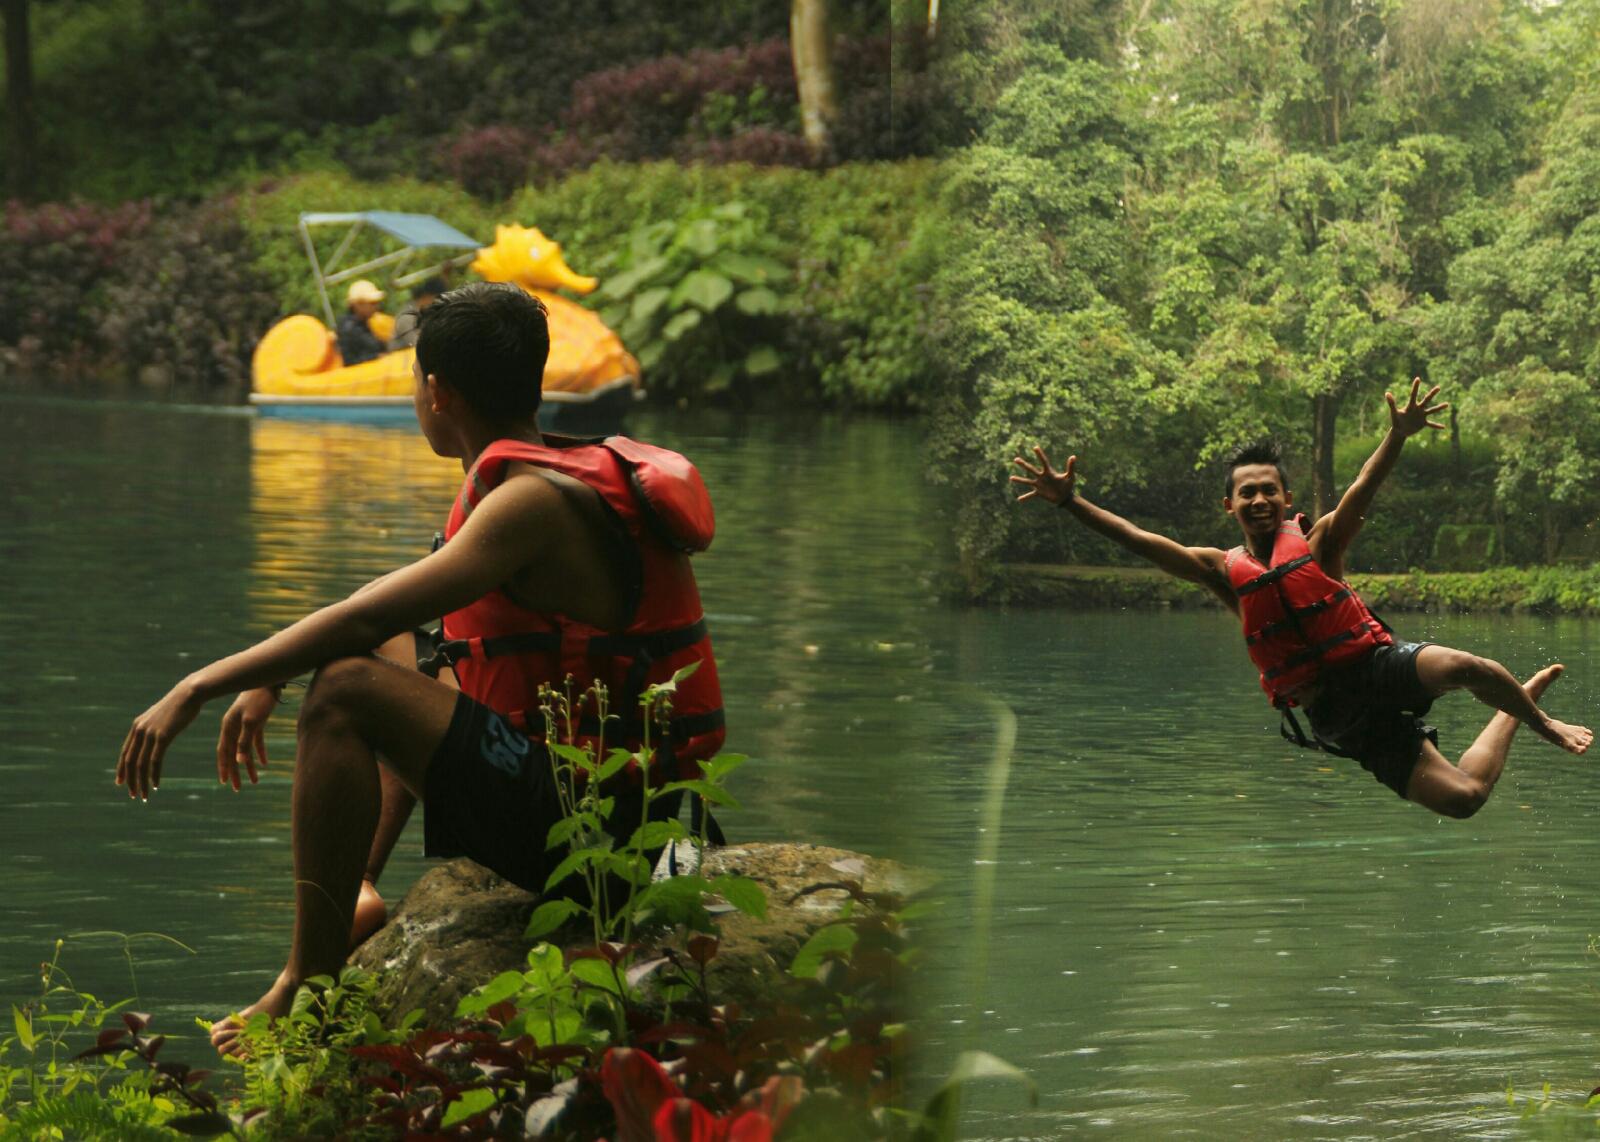 Situ Cipanten Majalengka Objek Wisata Jawa Barat Dengan Wahana Yang Penuh Warna